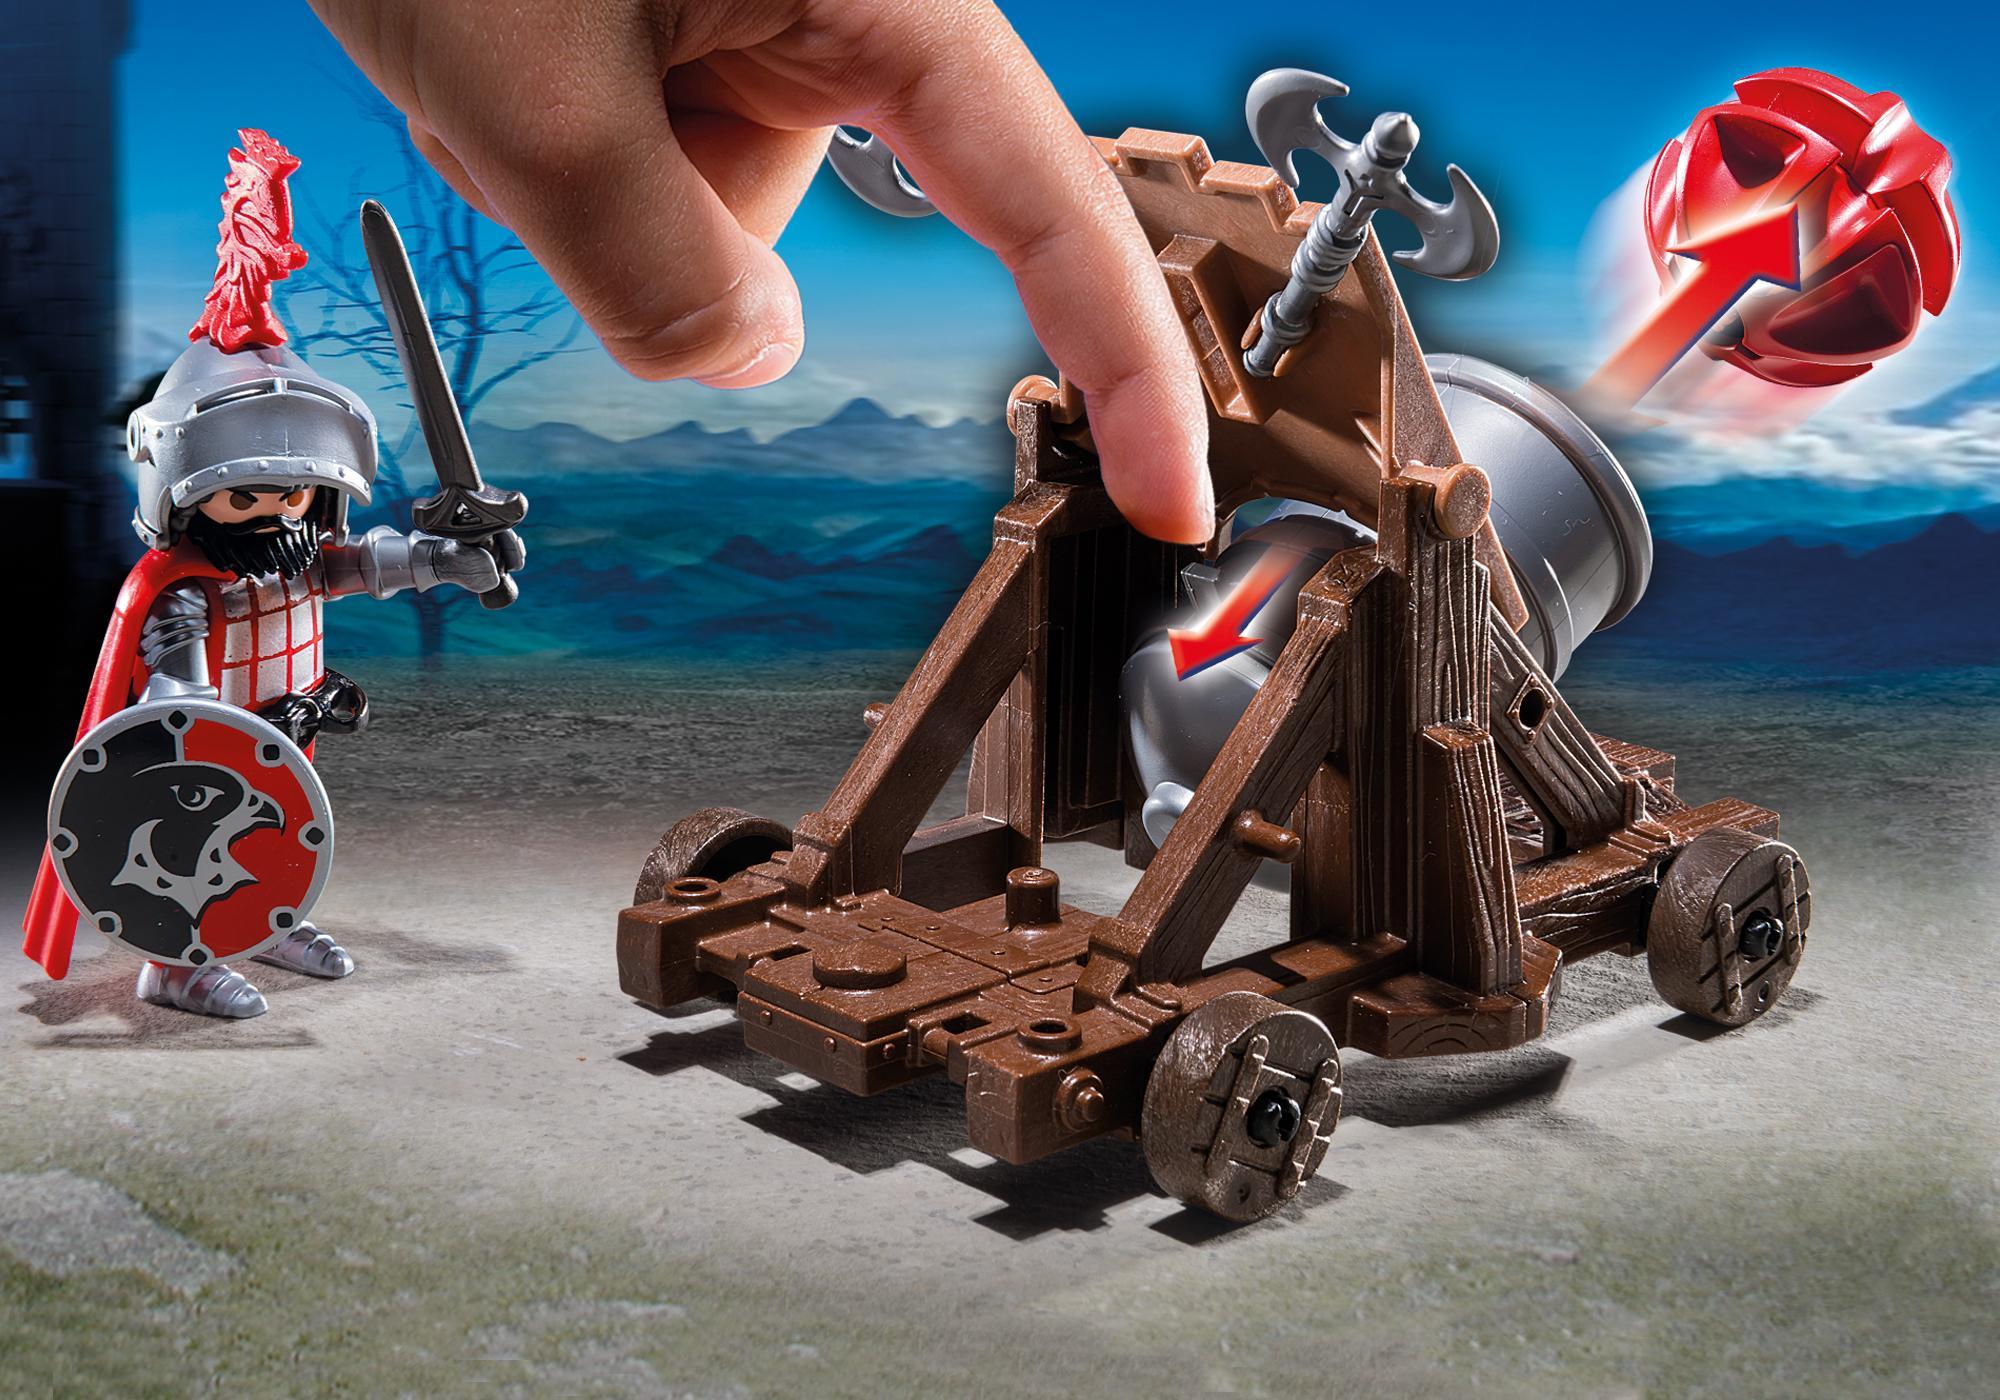 http://media.playmobil.com/i/playmobil/6038_product_extra2